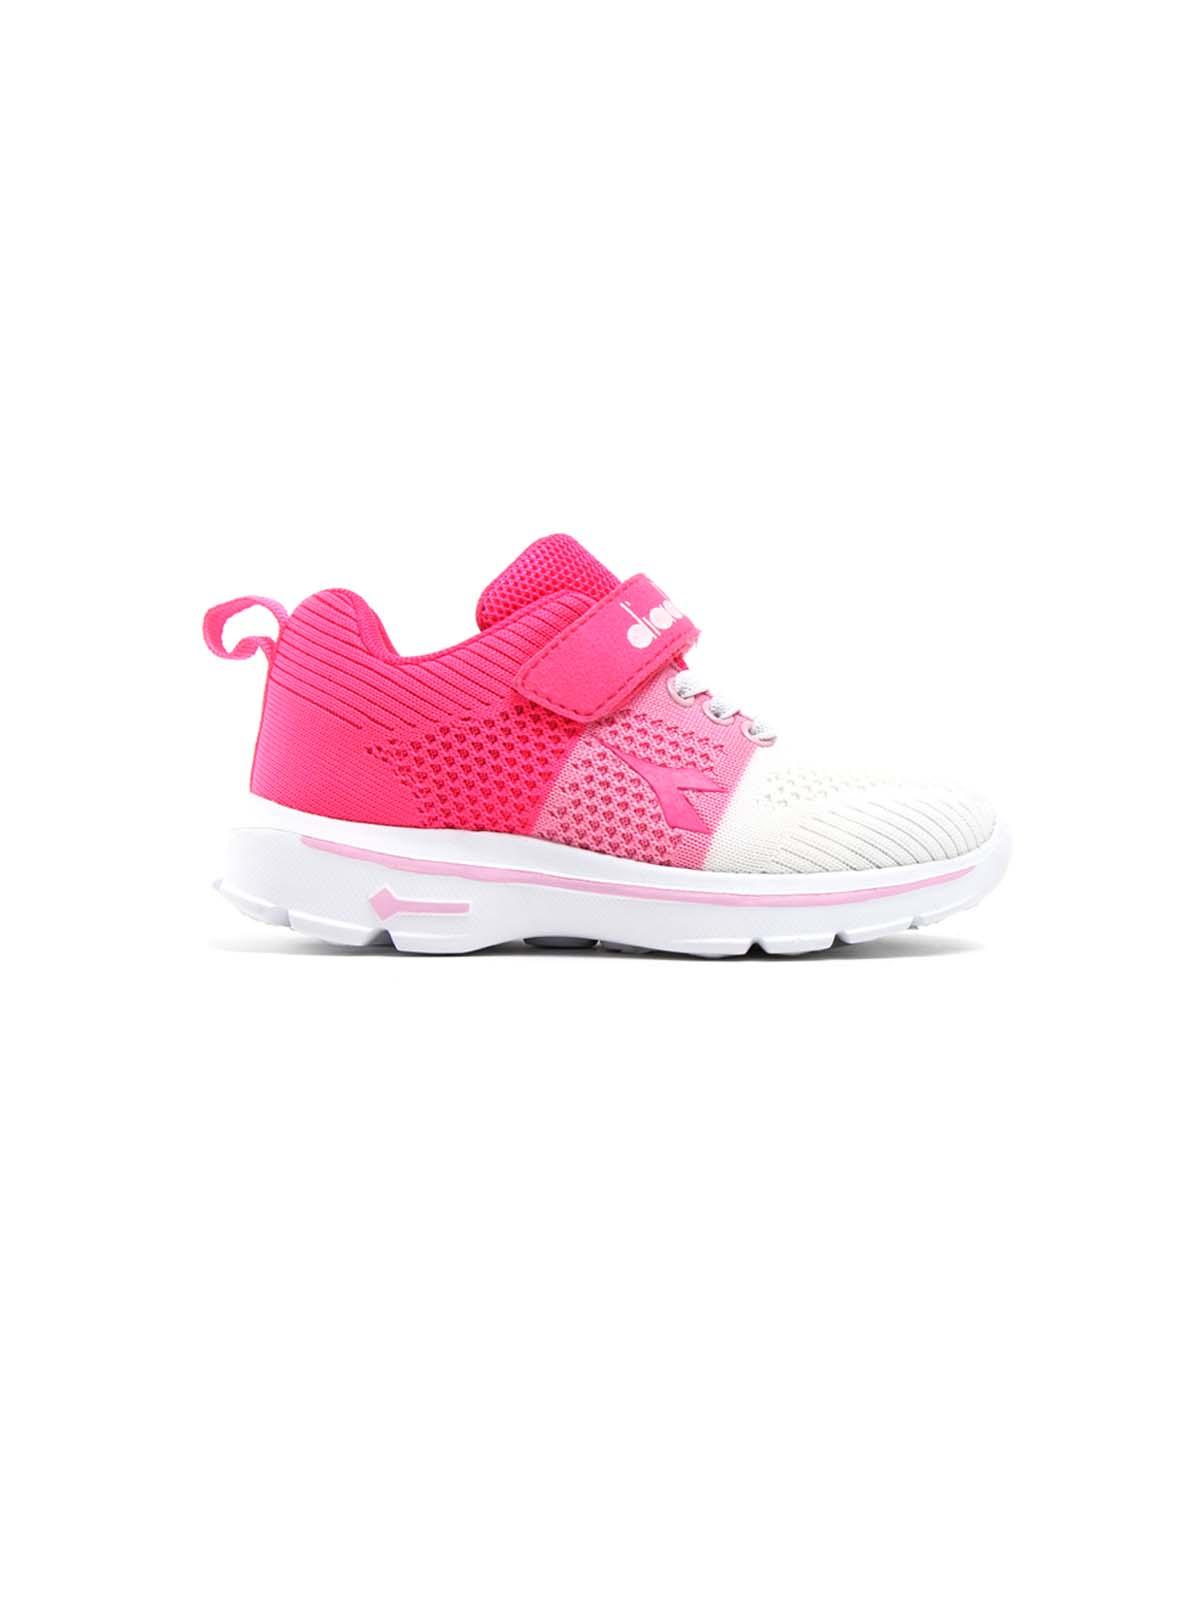 Diadora ילדות // נעלי ספורט ורוד פוקסיה / לבן